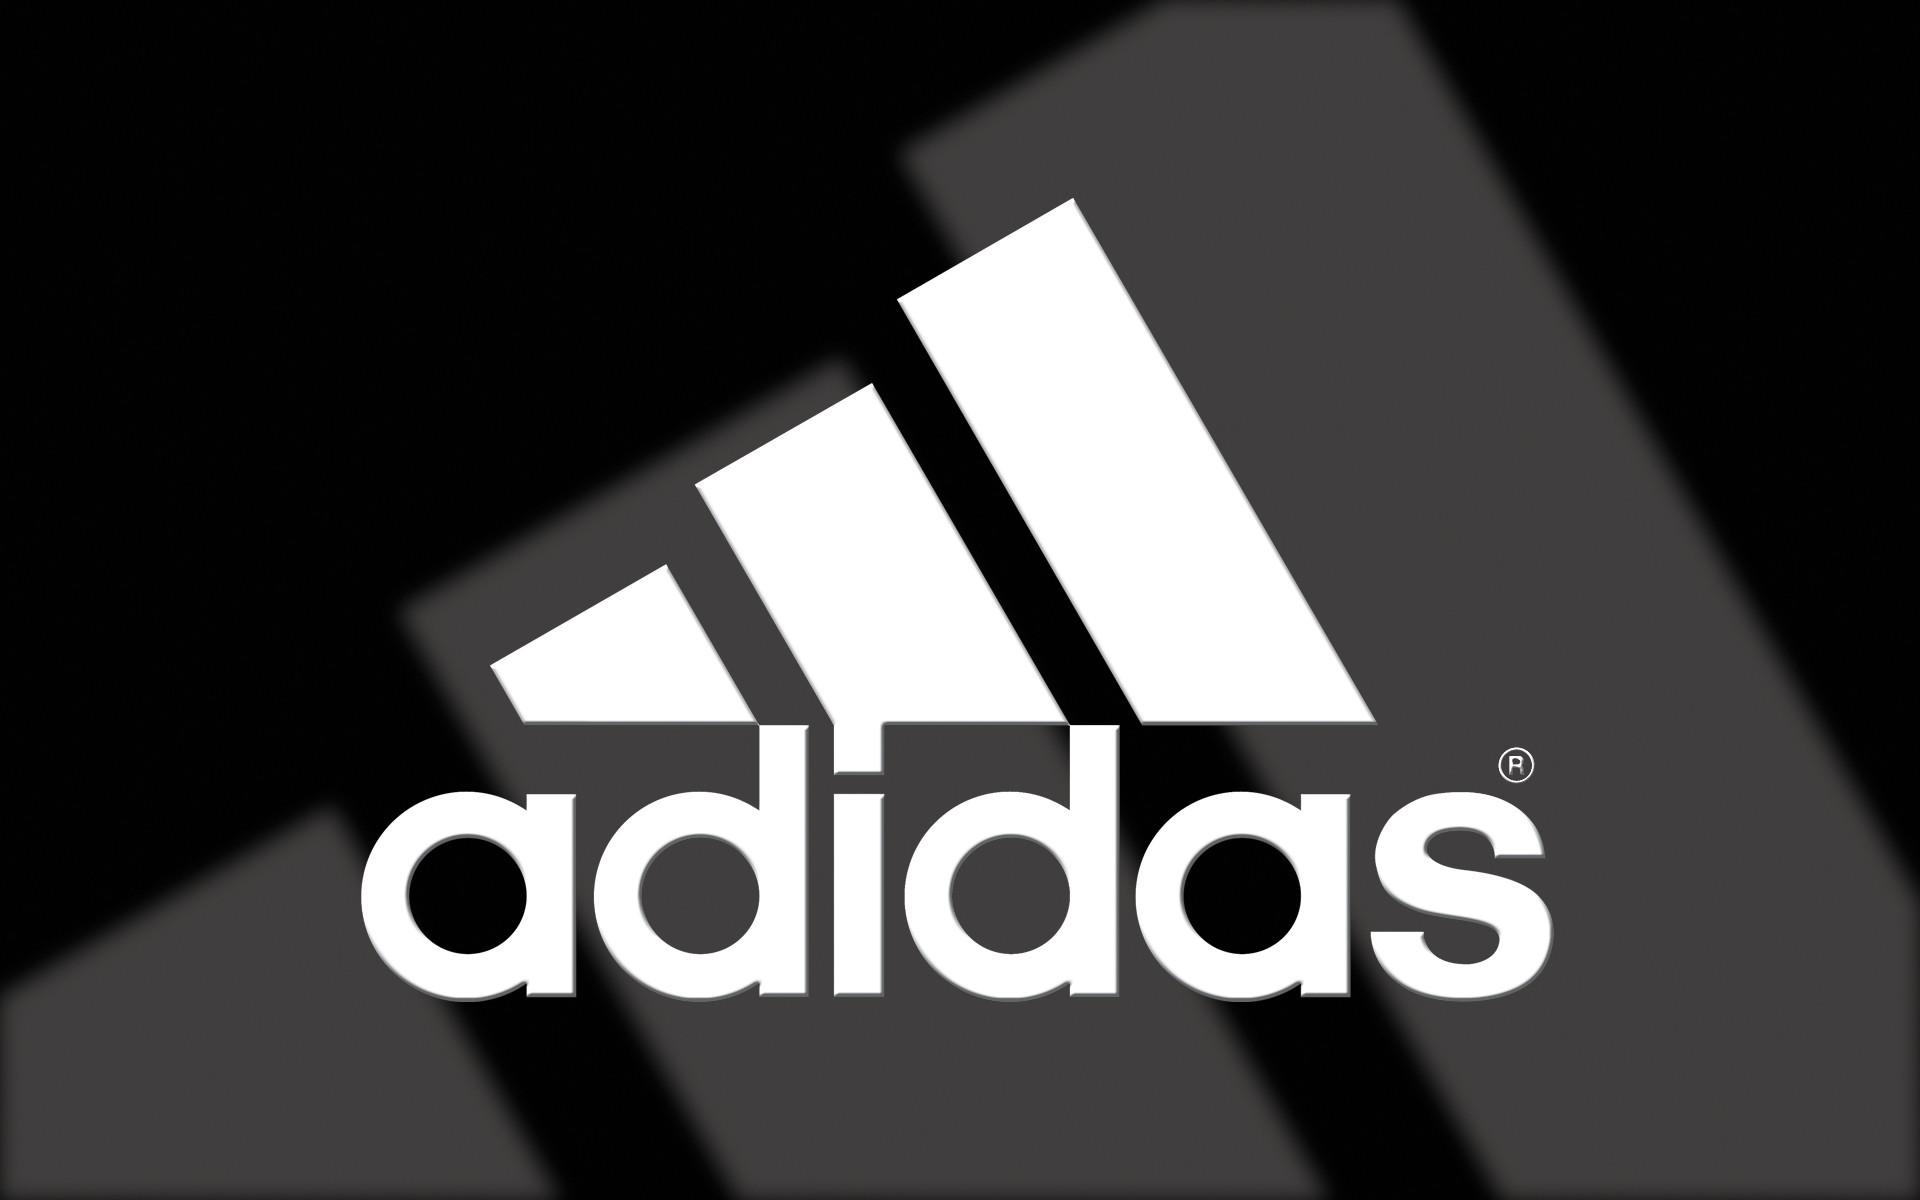 adidas wallpaper, adidas phone wallpaper